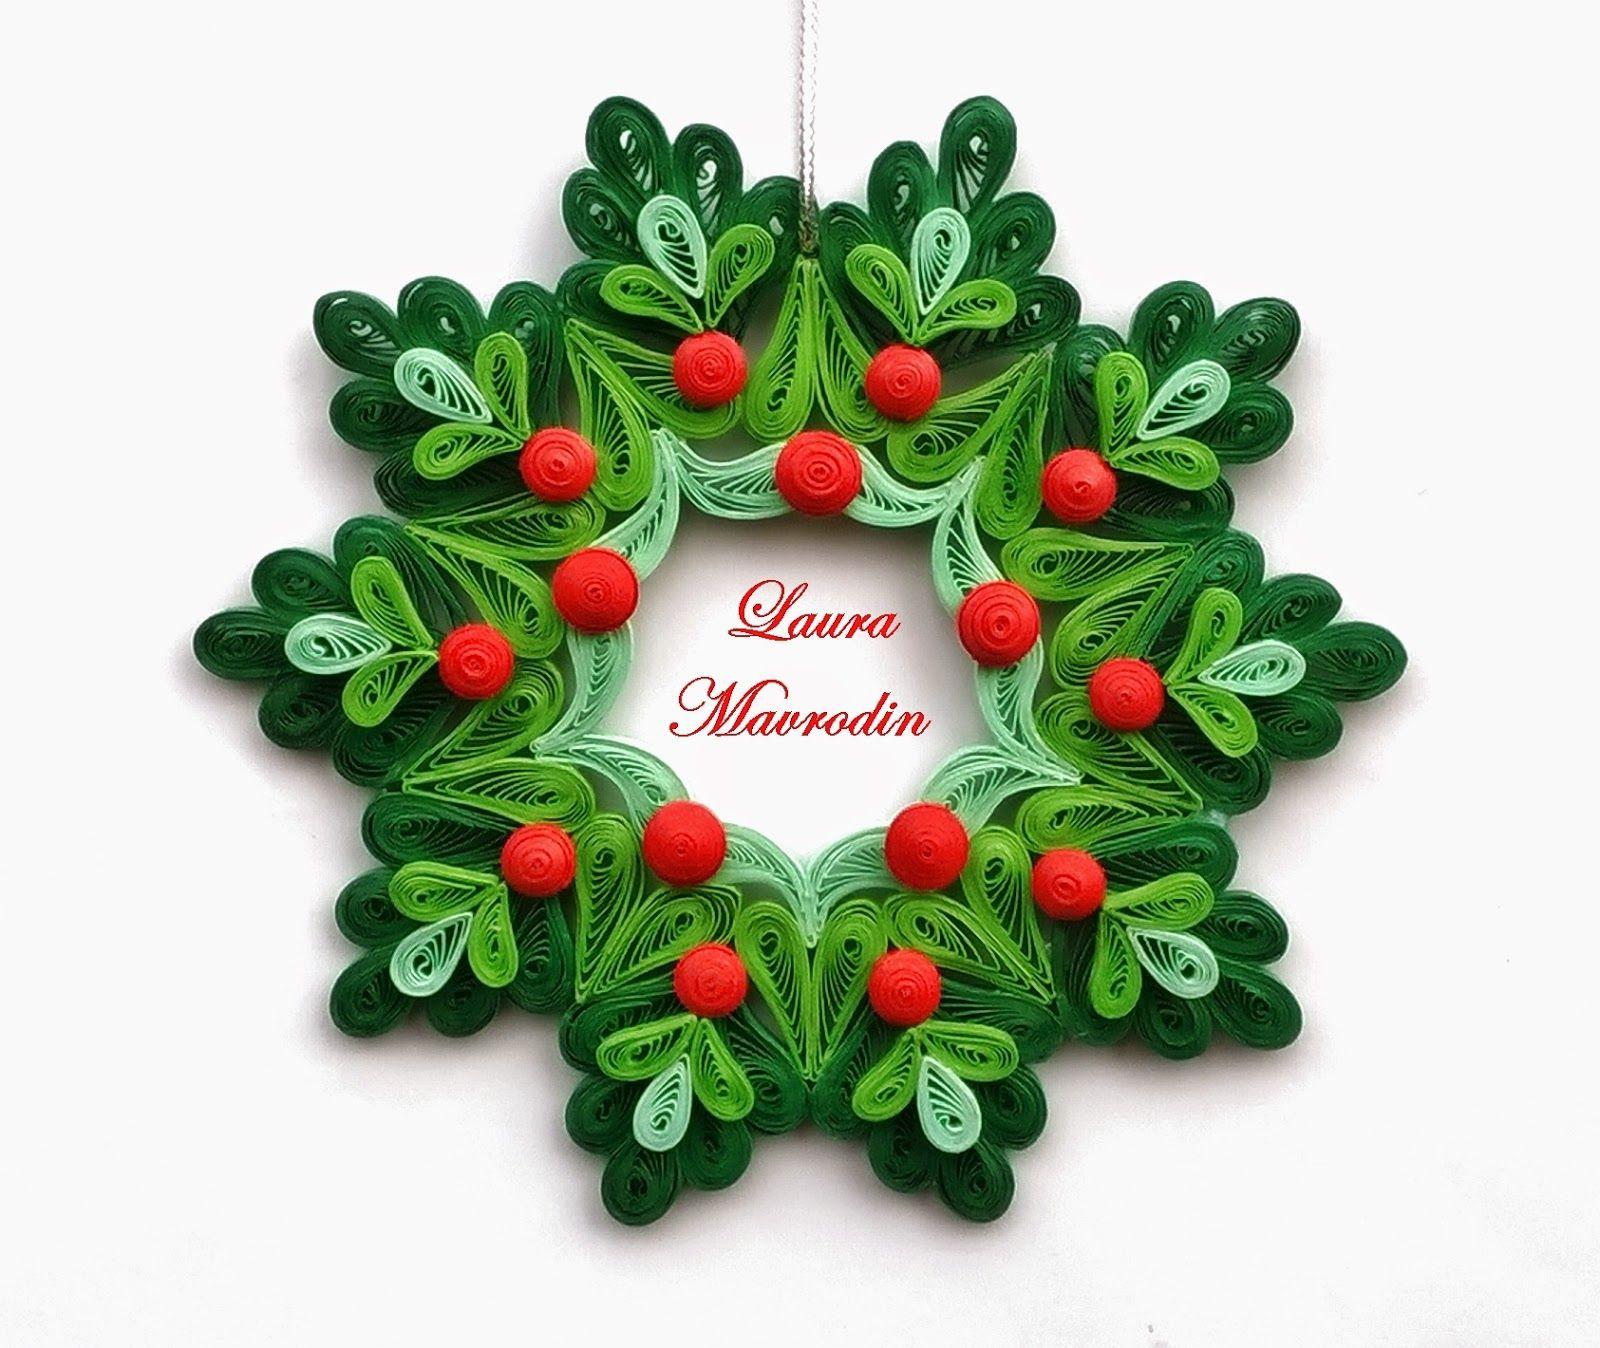 Quilling My Passion Ornament Pentru Craciun Quilling Christmas Quilling Flowers Quilling Designs